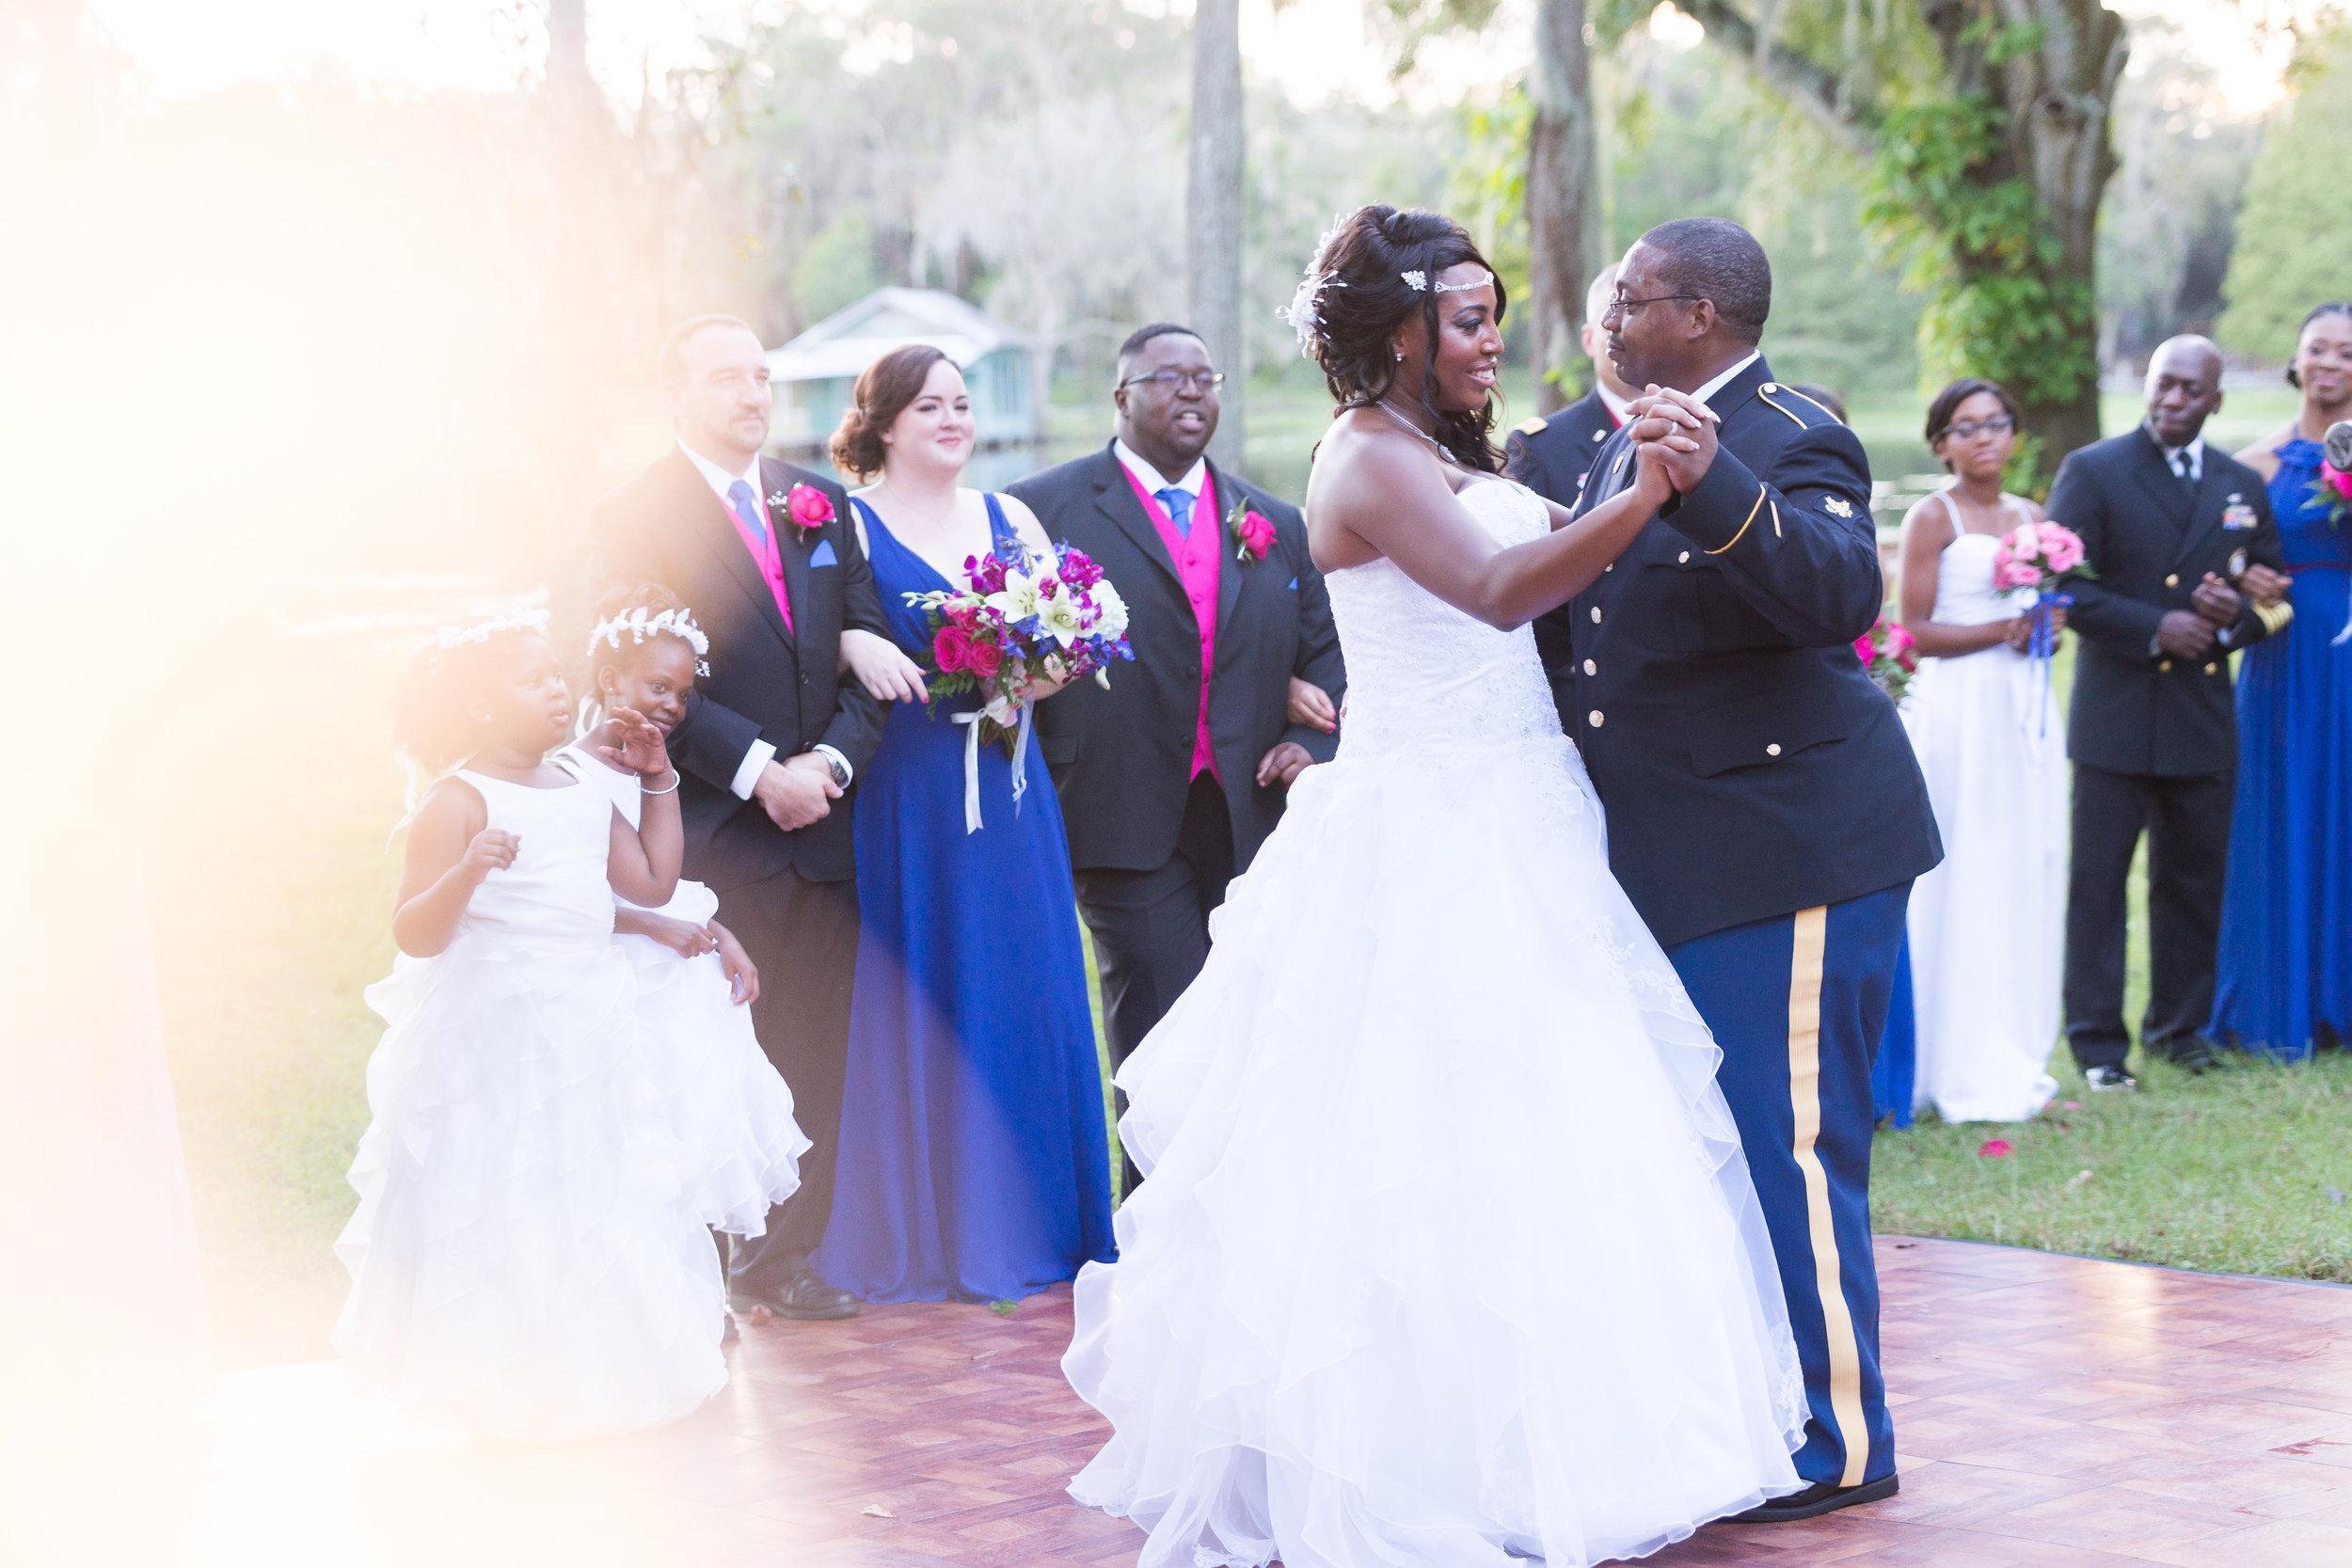 Old McMicky's Farm wedding Mission I Do, Tampa wedding, Tampa wedding photographer